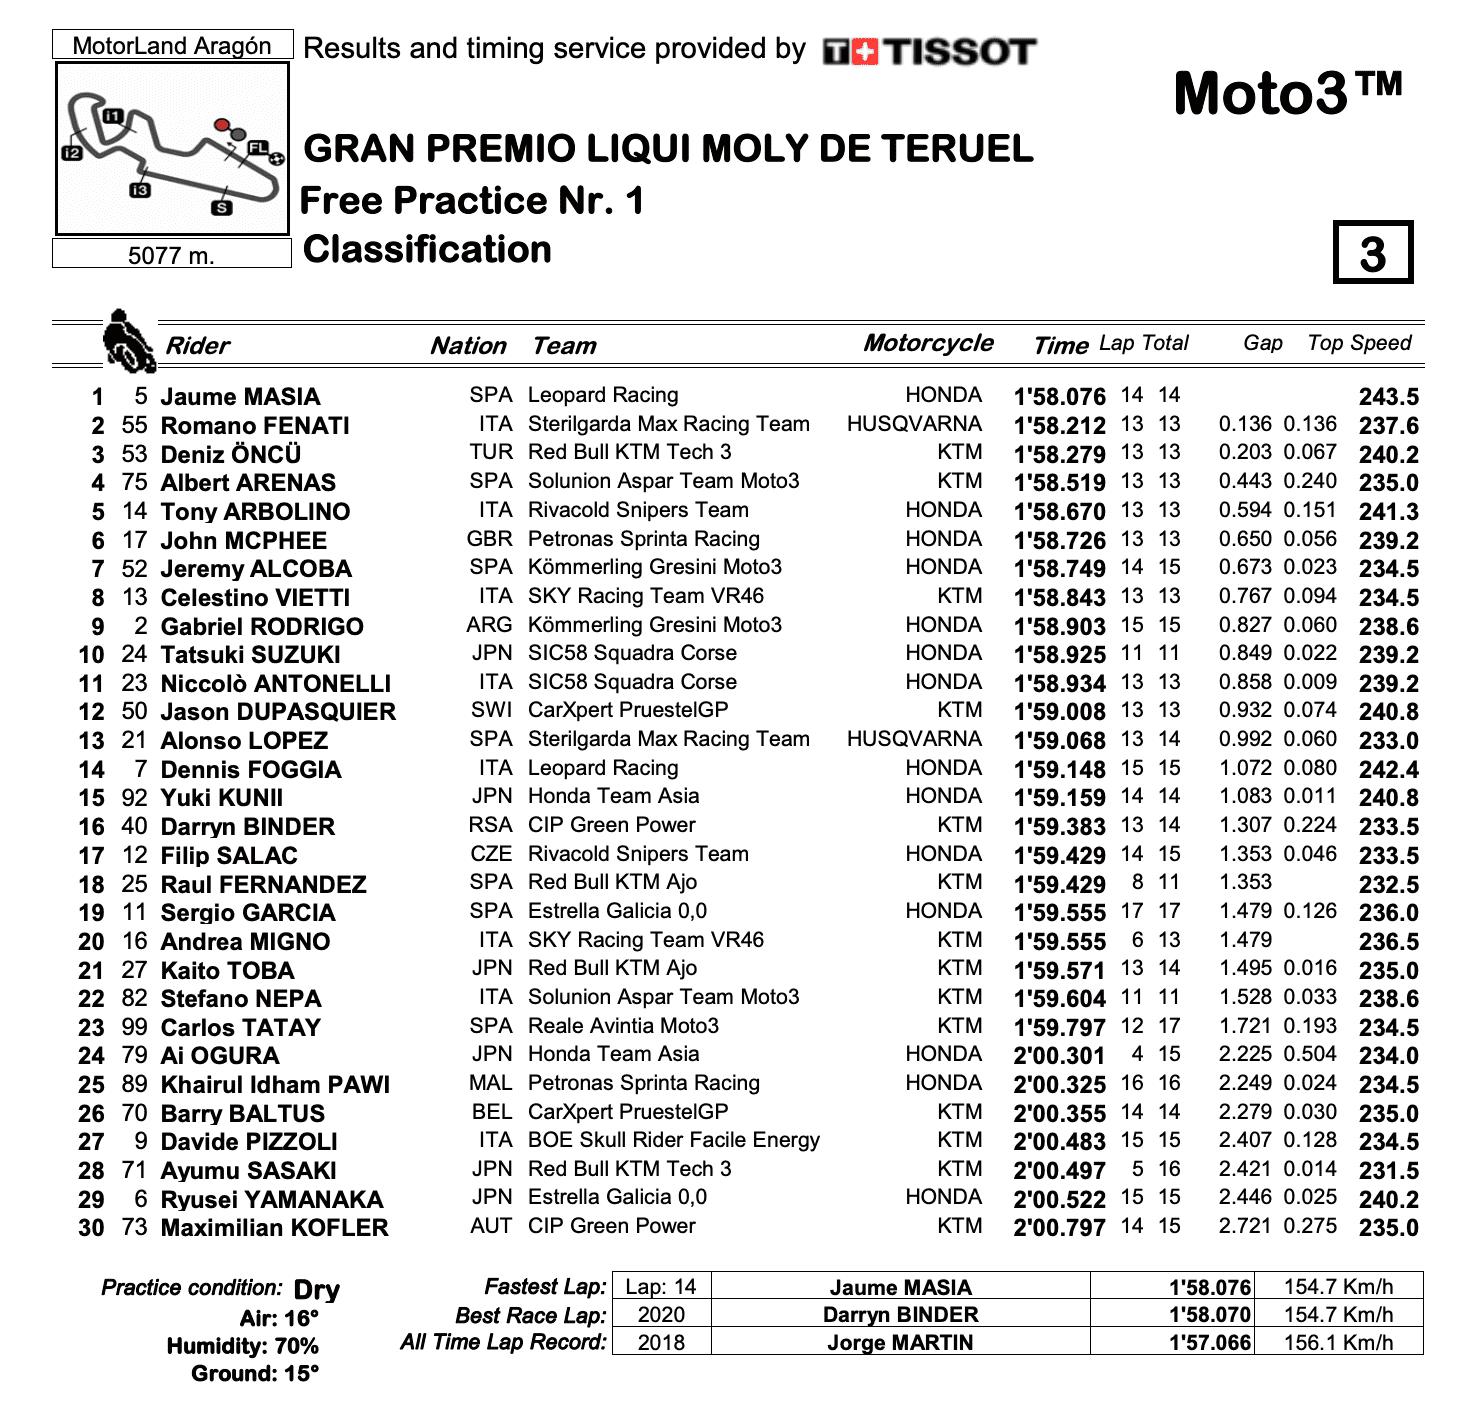 Moto3 2020テルエルGP FP1結果